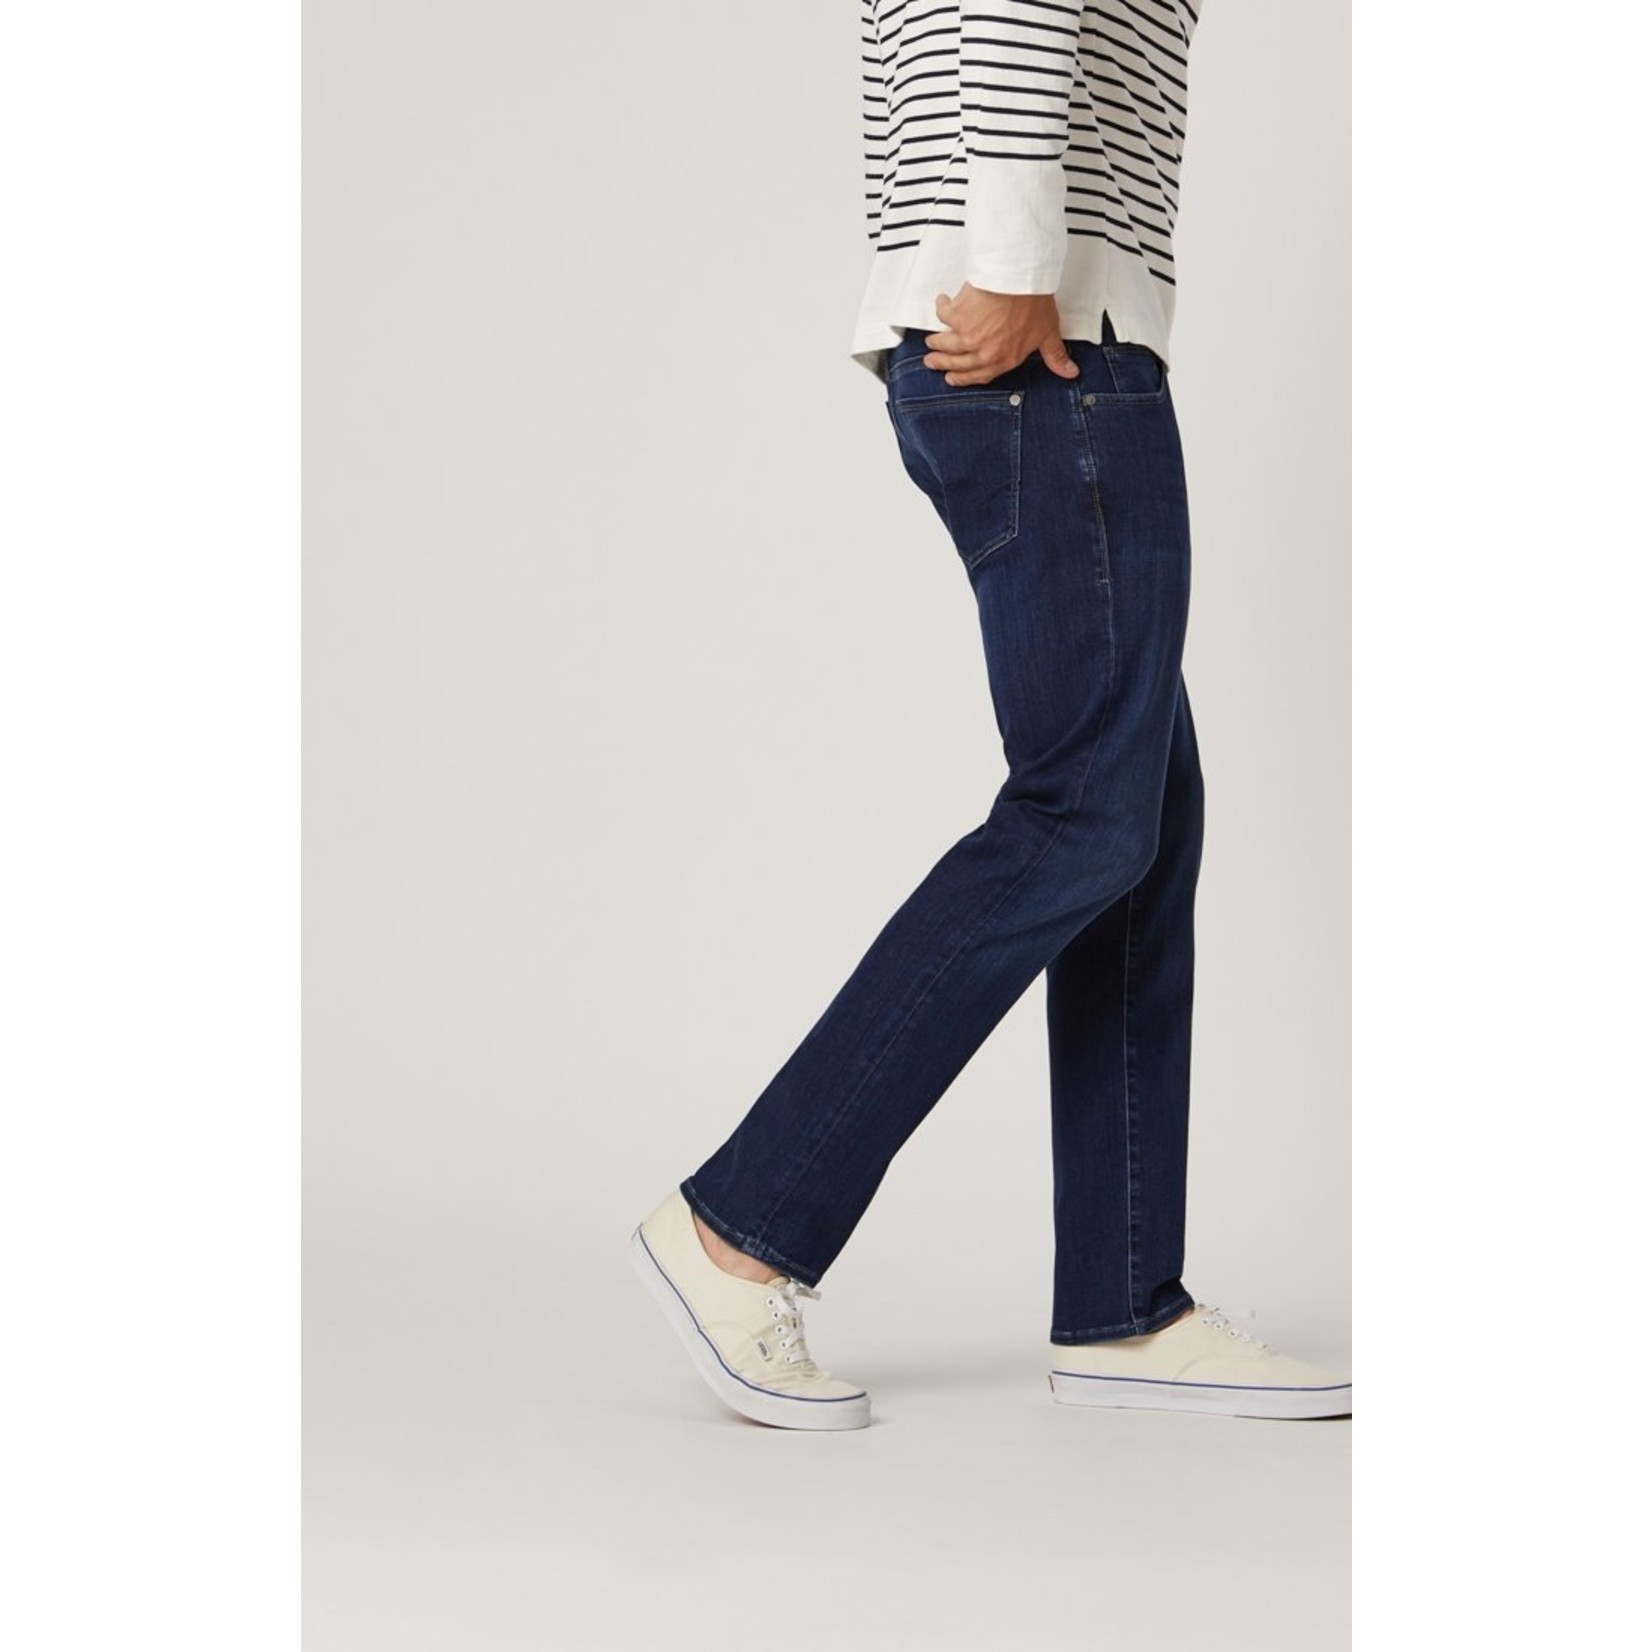 Mavi Mavi Marcus Dark Blue Supermove Slim Straight Leg